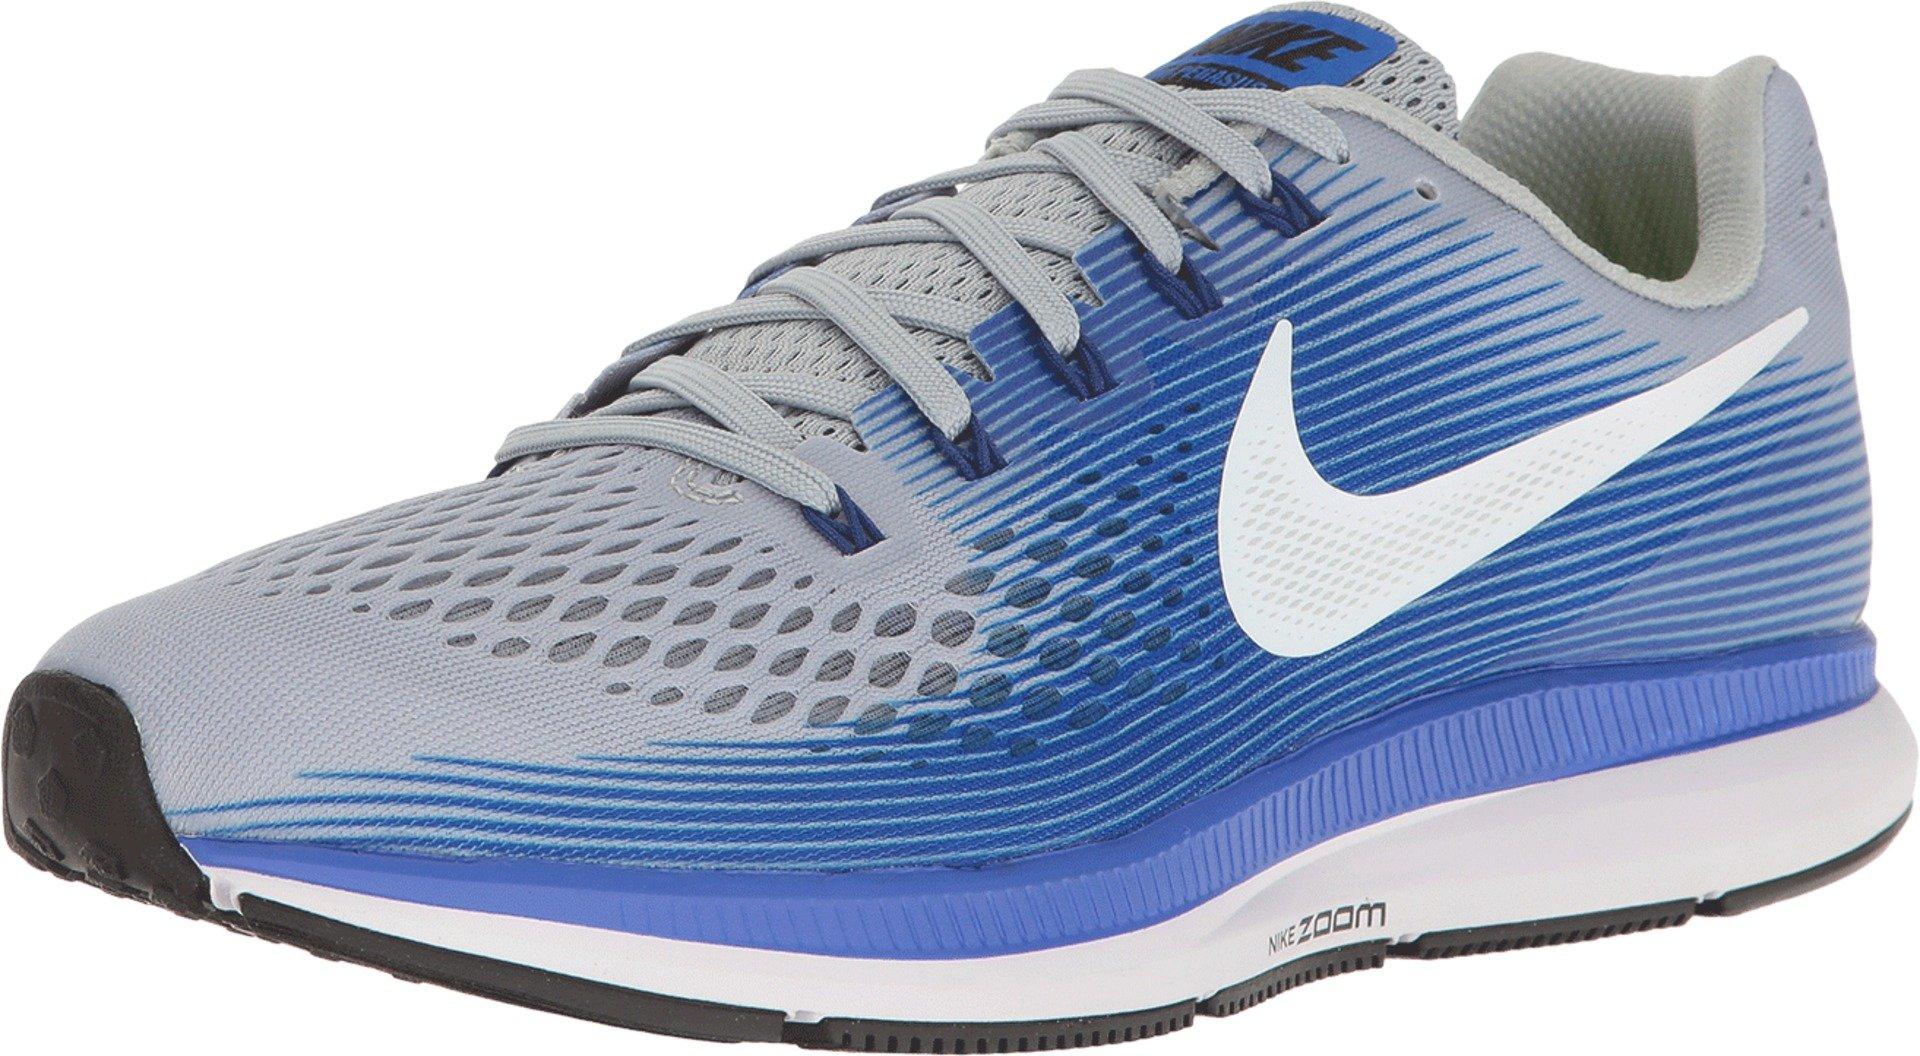 Nike Air Zoom Pegasus 34 (4e) Mens 880557-007 Size 6.5